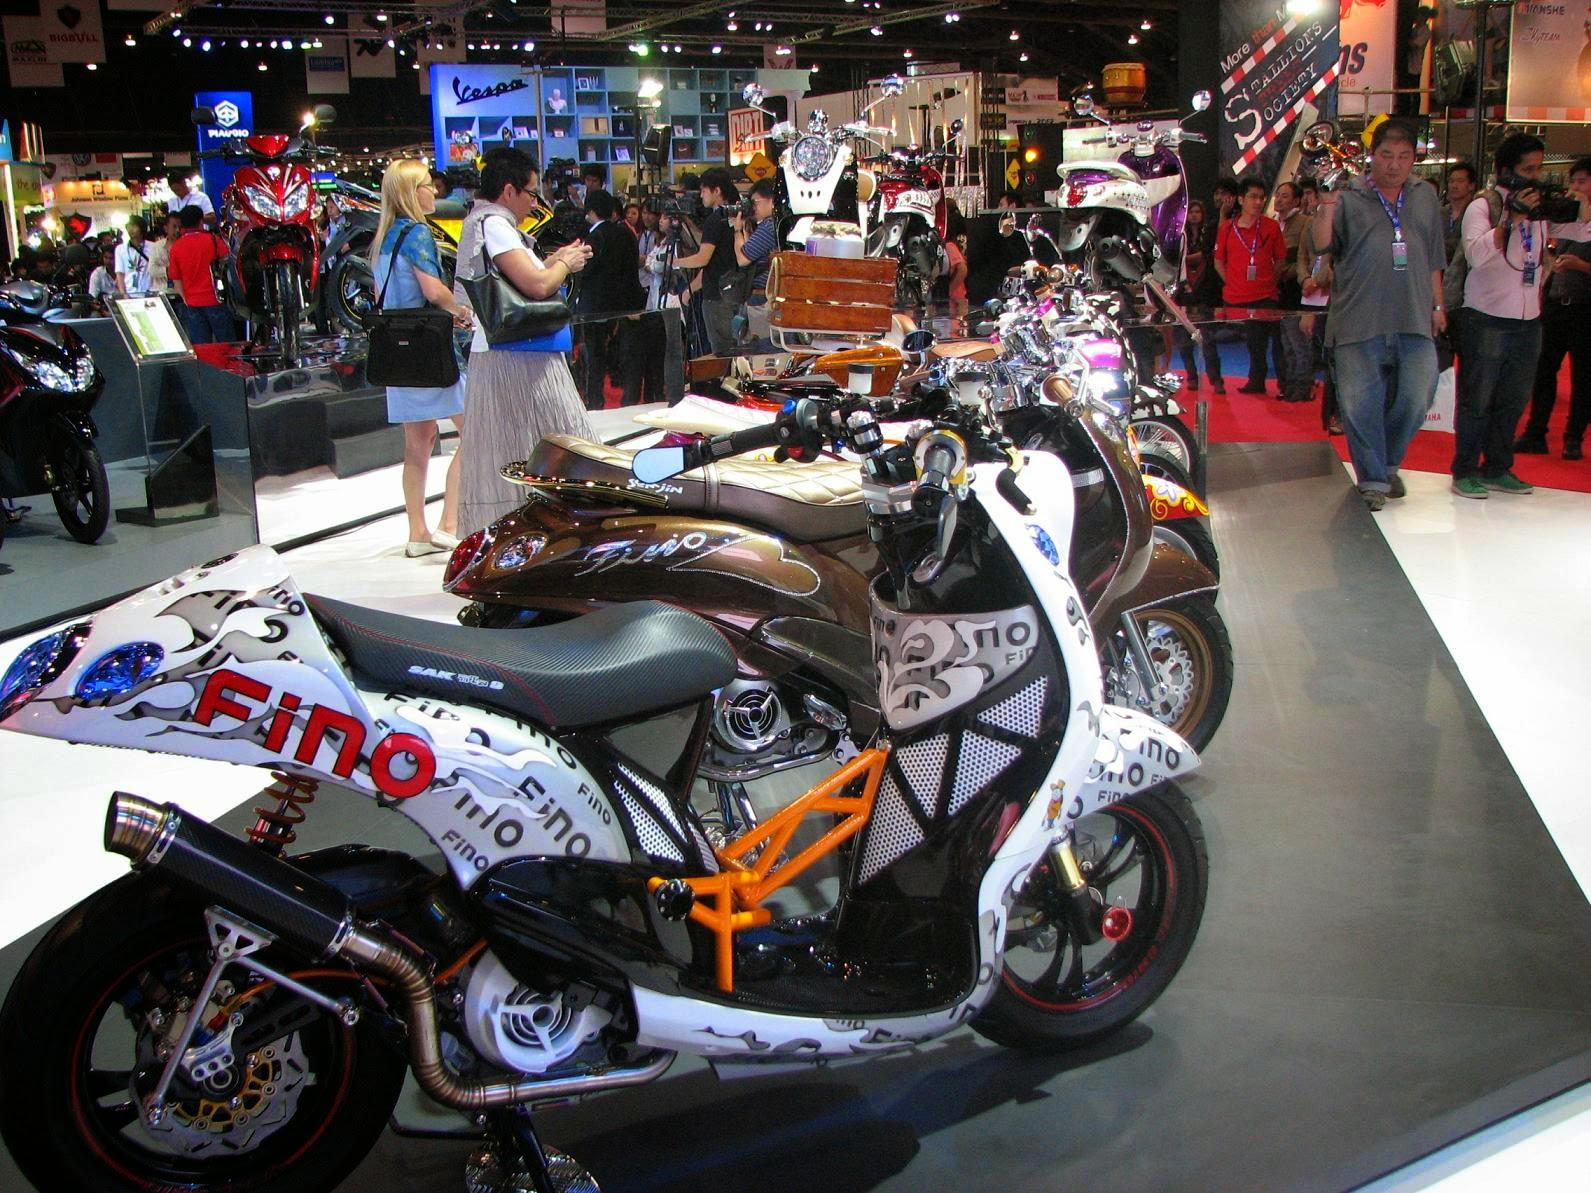 Modifikasi Yamaha Mio Cafe Racer Milik Youtuber